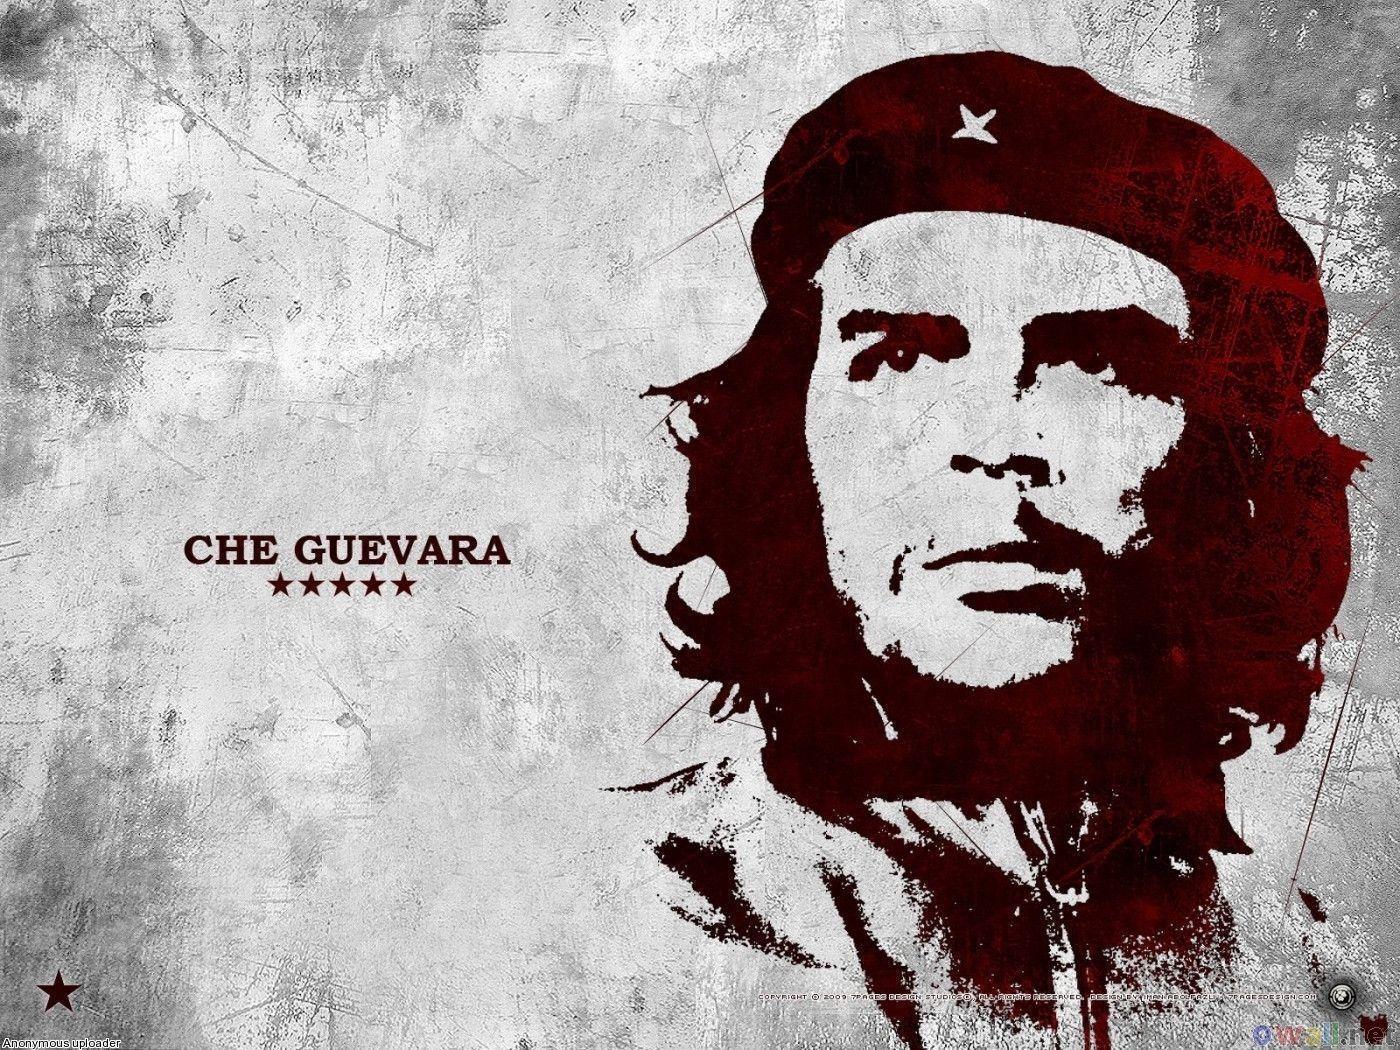 Che Guevara Wallpapers 1400x1050